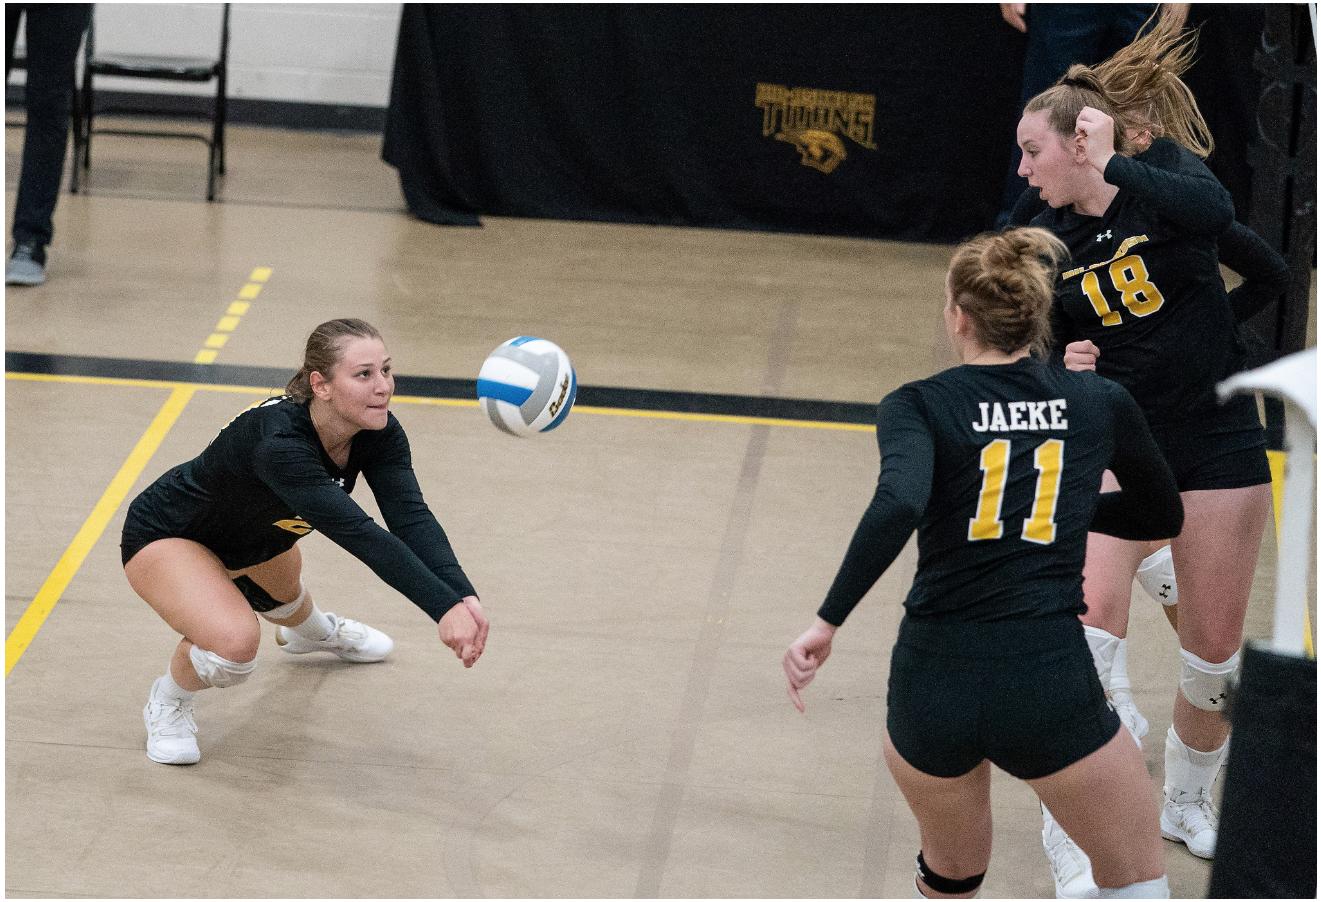 UW Oshkosh sophomore Becky Brezen (21) passes a ball against Oswego State while senior Sam Jaeke (11) and freshman Kate Nottoli (18) set up to receive the pass. The Titans won the match 3-0.